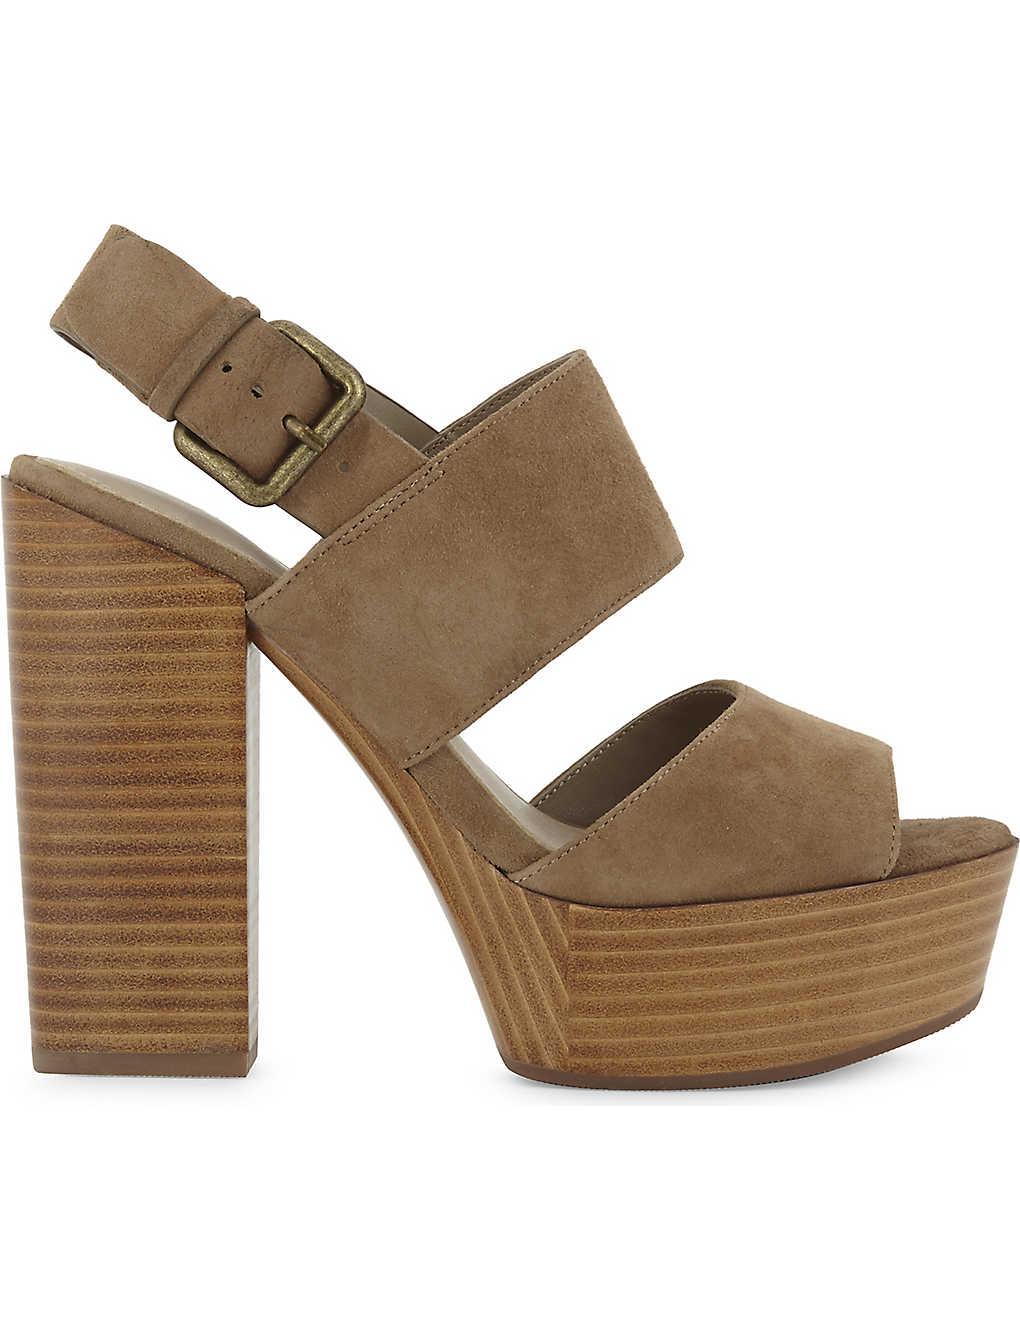 ee27ff71d4 ALDO - Maximoa suede platform sandals | Selfridges.com